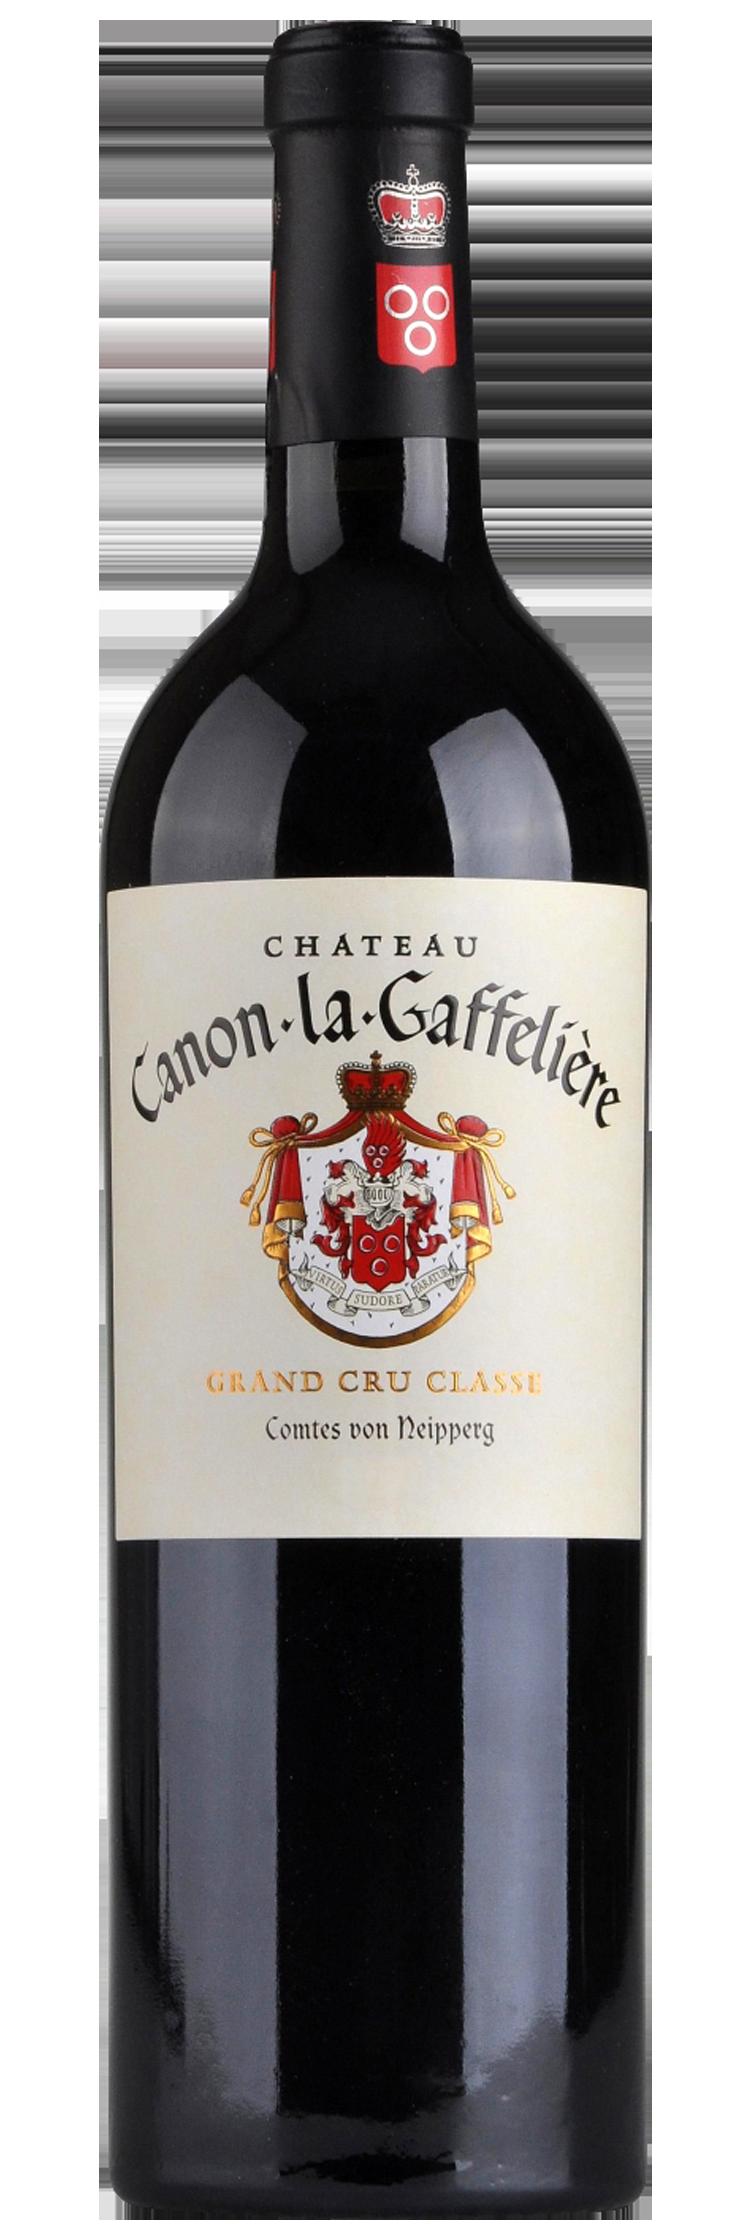 Château Canon La Gaffelière, 1er grand cru classé B